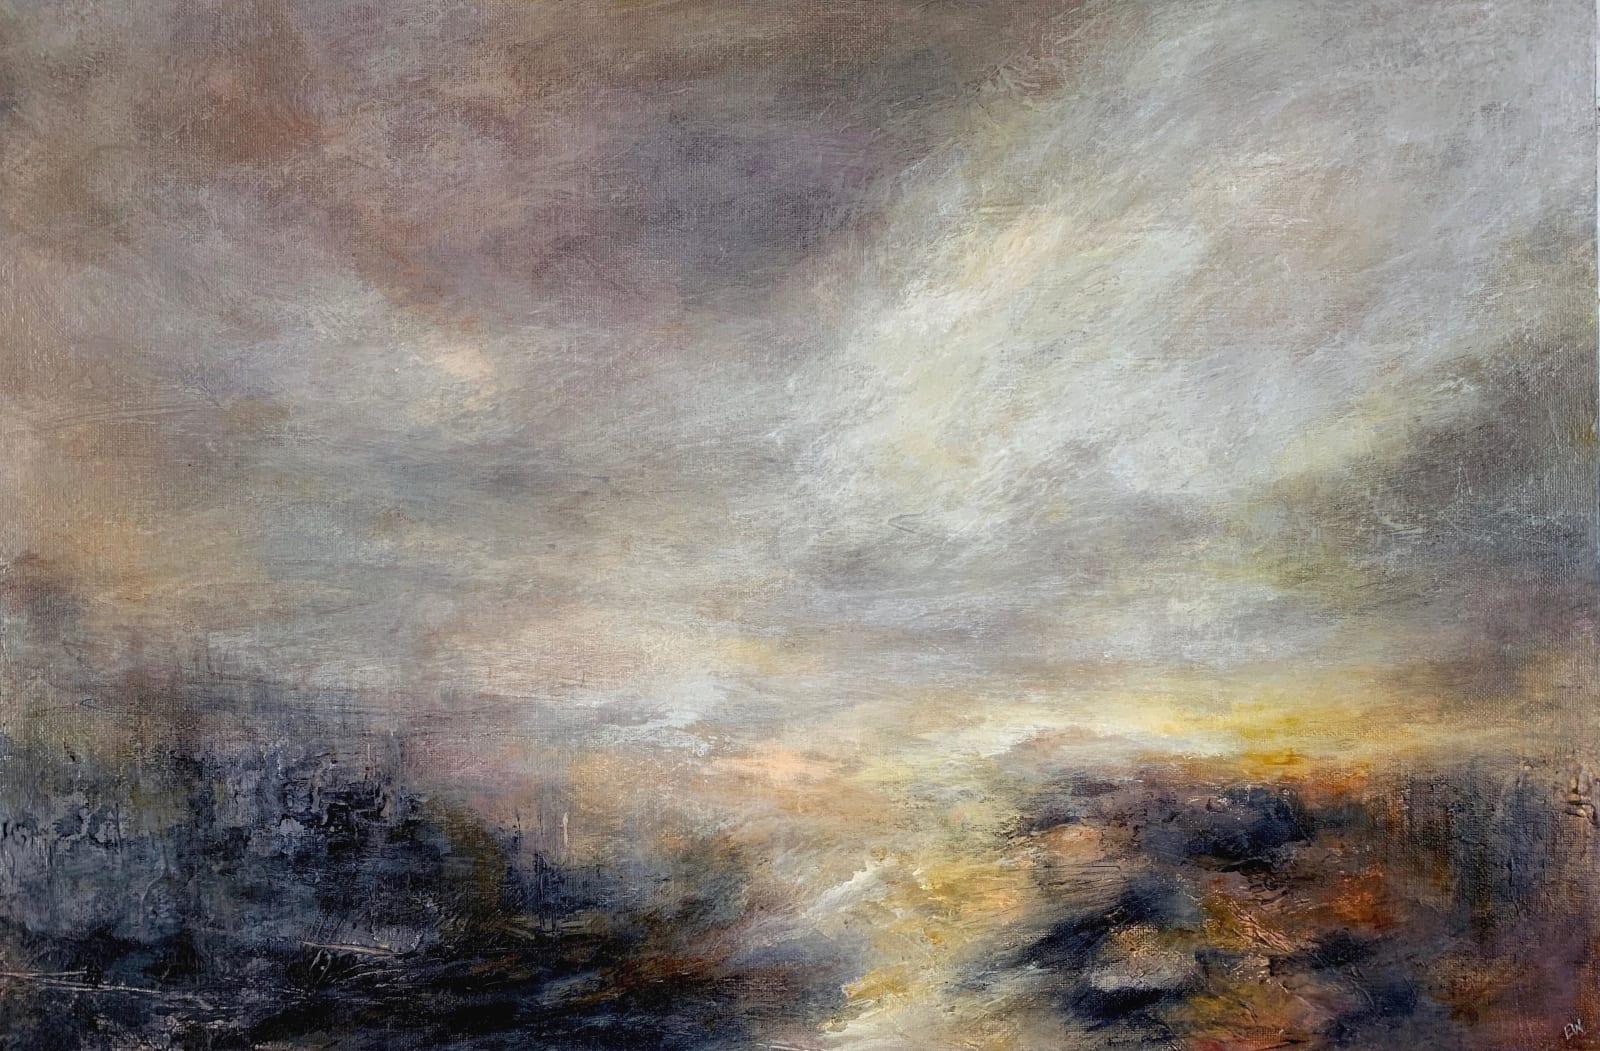 Emma Whitelock, Origin, 2019